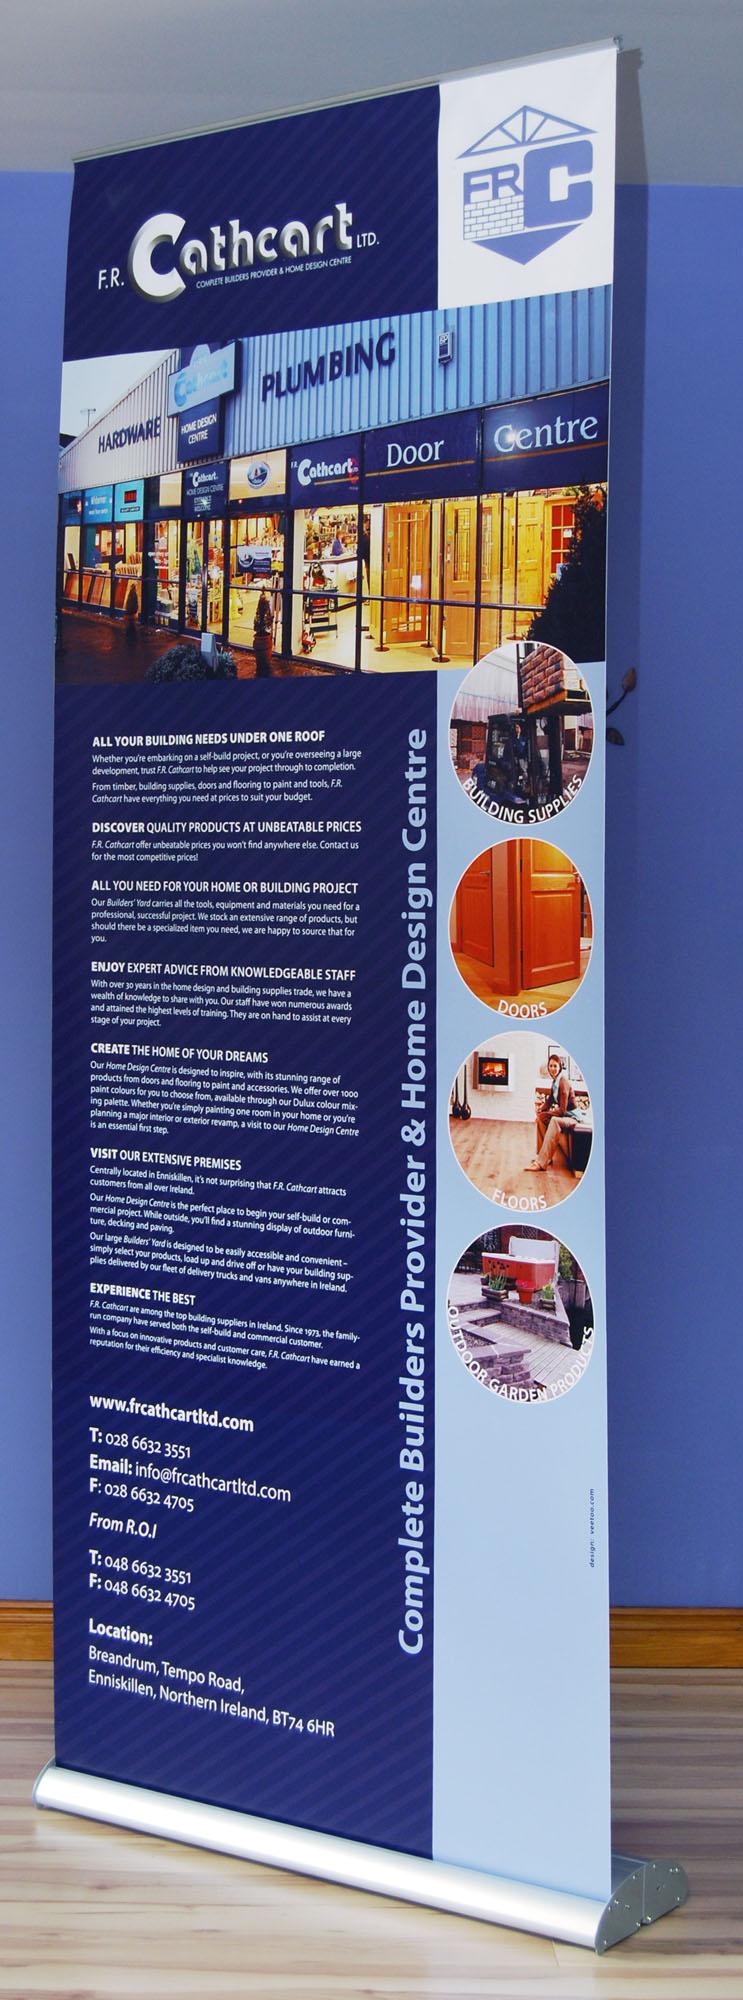 Graphic designers Belfast design 6a photo